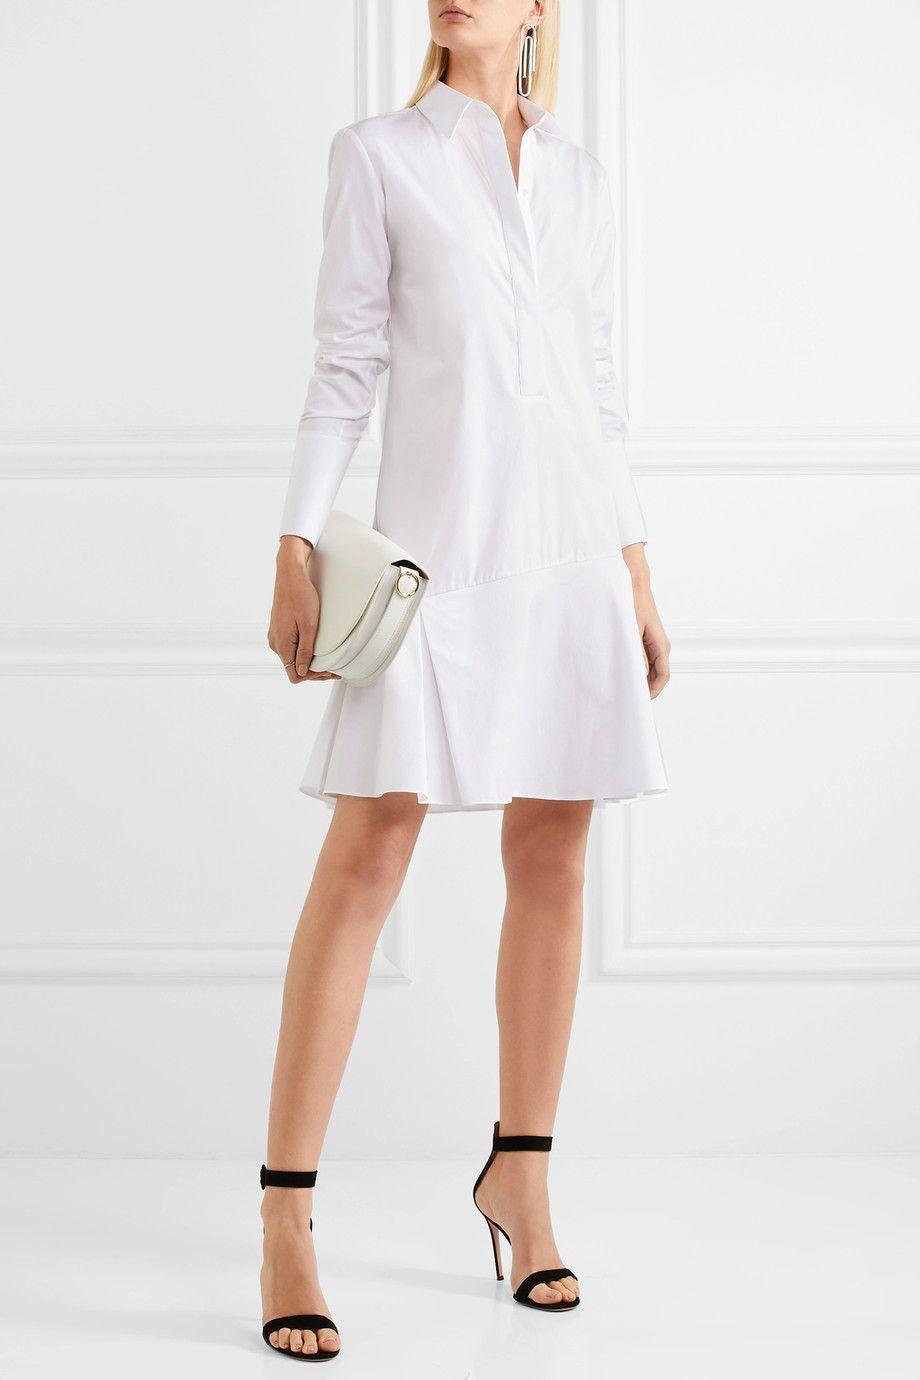 Victoria Victoria Beckham Pleated Cotton Poplin Dress Net A Porter Com Poplin Dress Cotton Poplin Dress Dresses [ 1380 x 920 Pixel ]